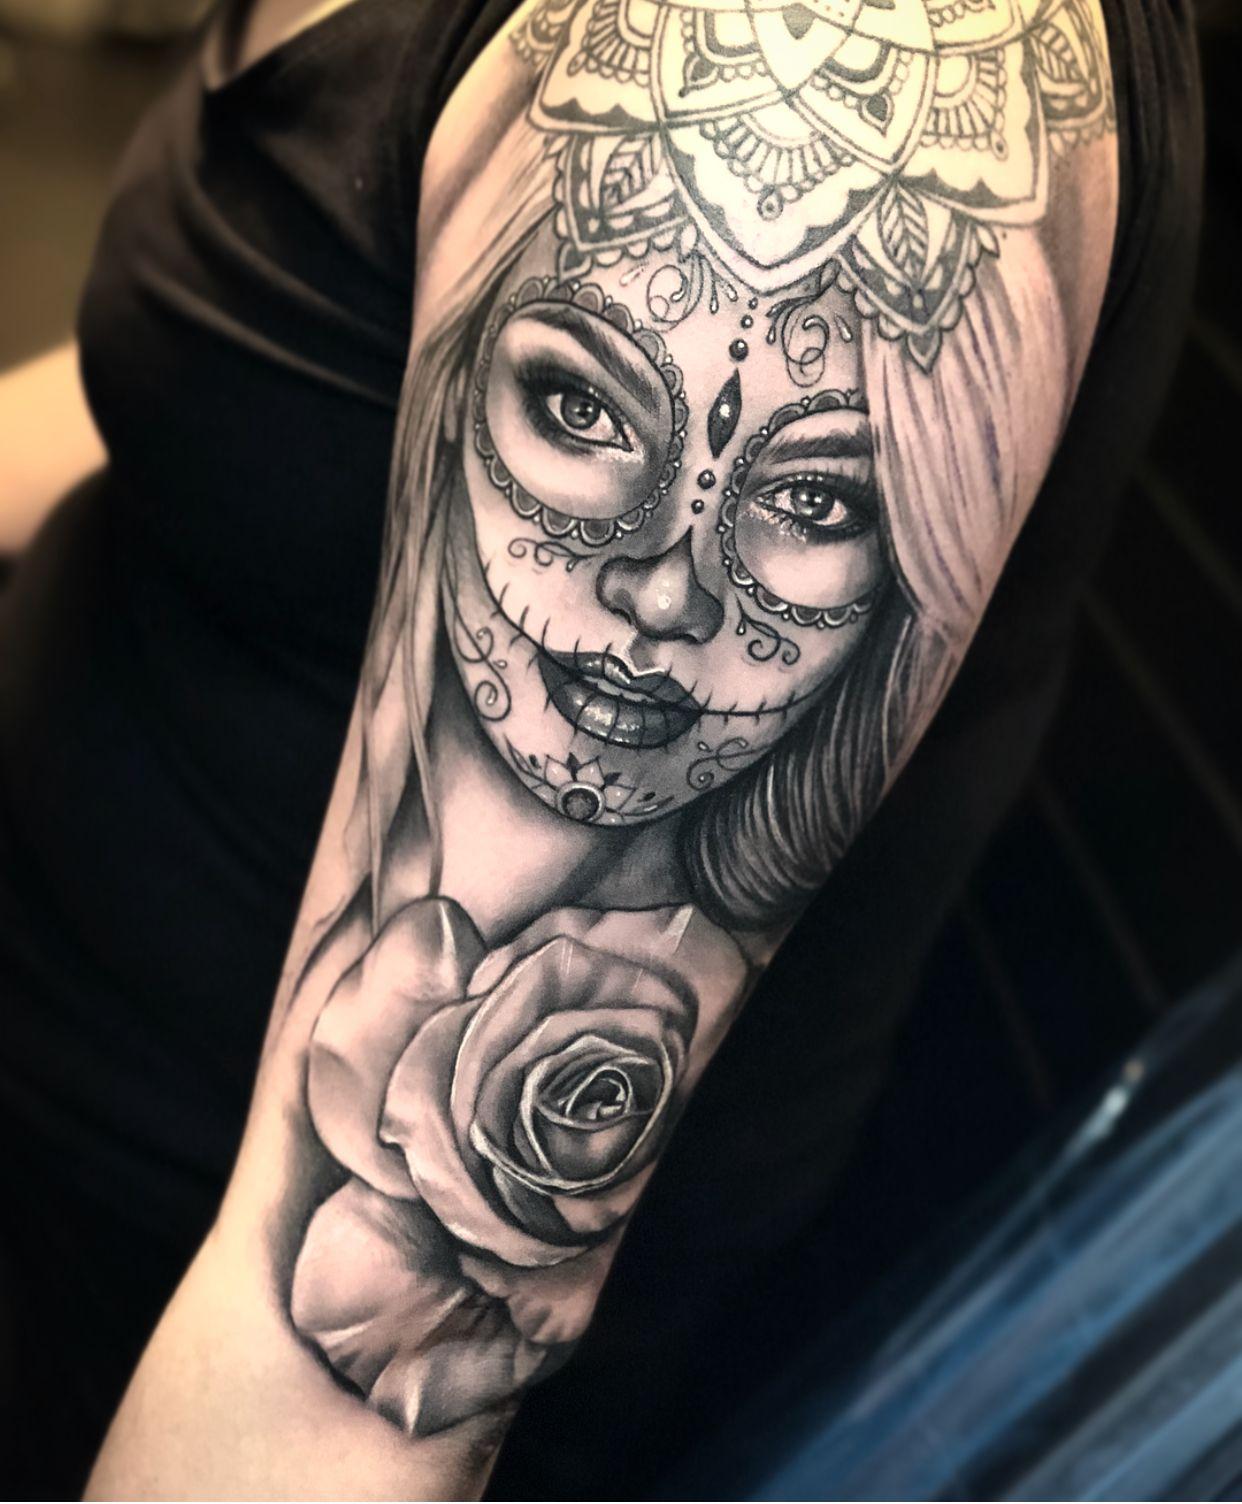 Tattoo Sugarlady Roses Skull Rose Tattoos Skull Girl Tattoo Sugar Skull Tattoos